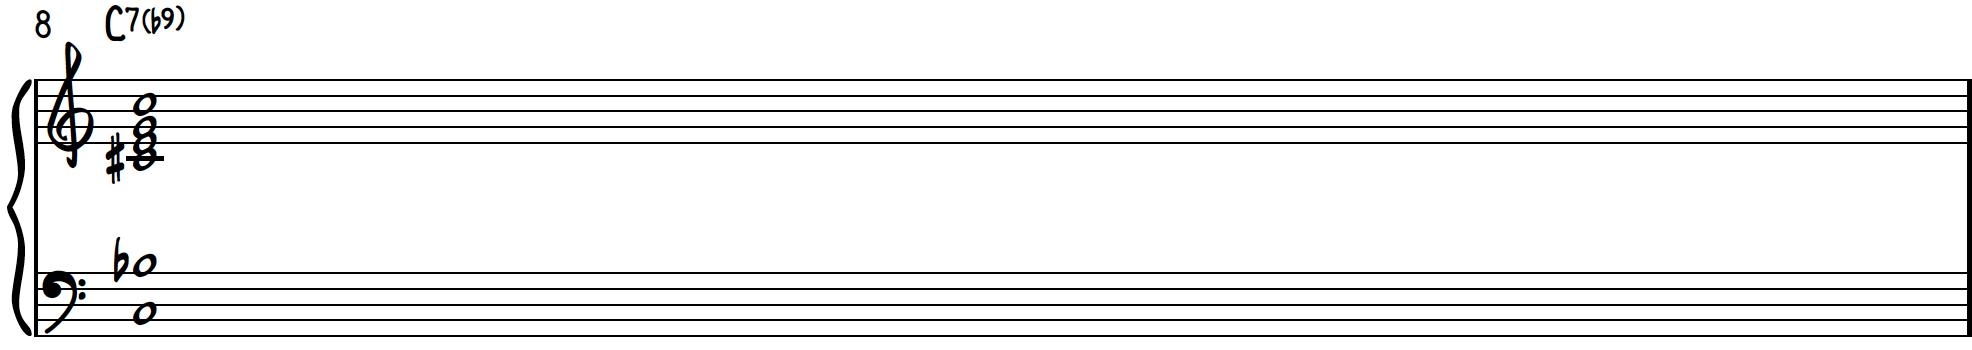 Dissonant Chord 3 transformed to jazz chord C7(b9) on piano